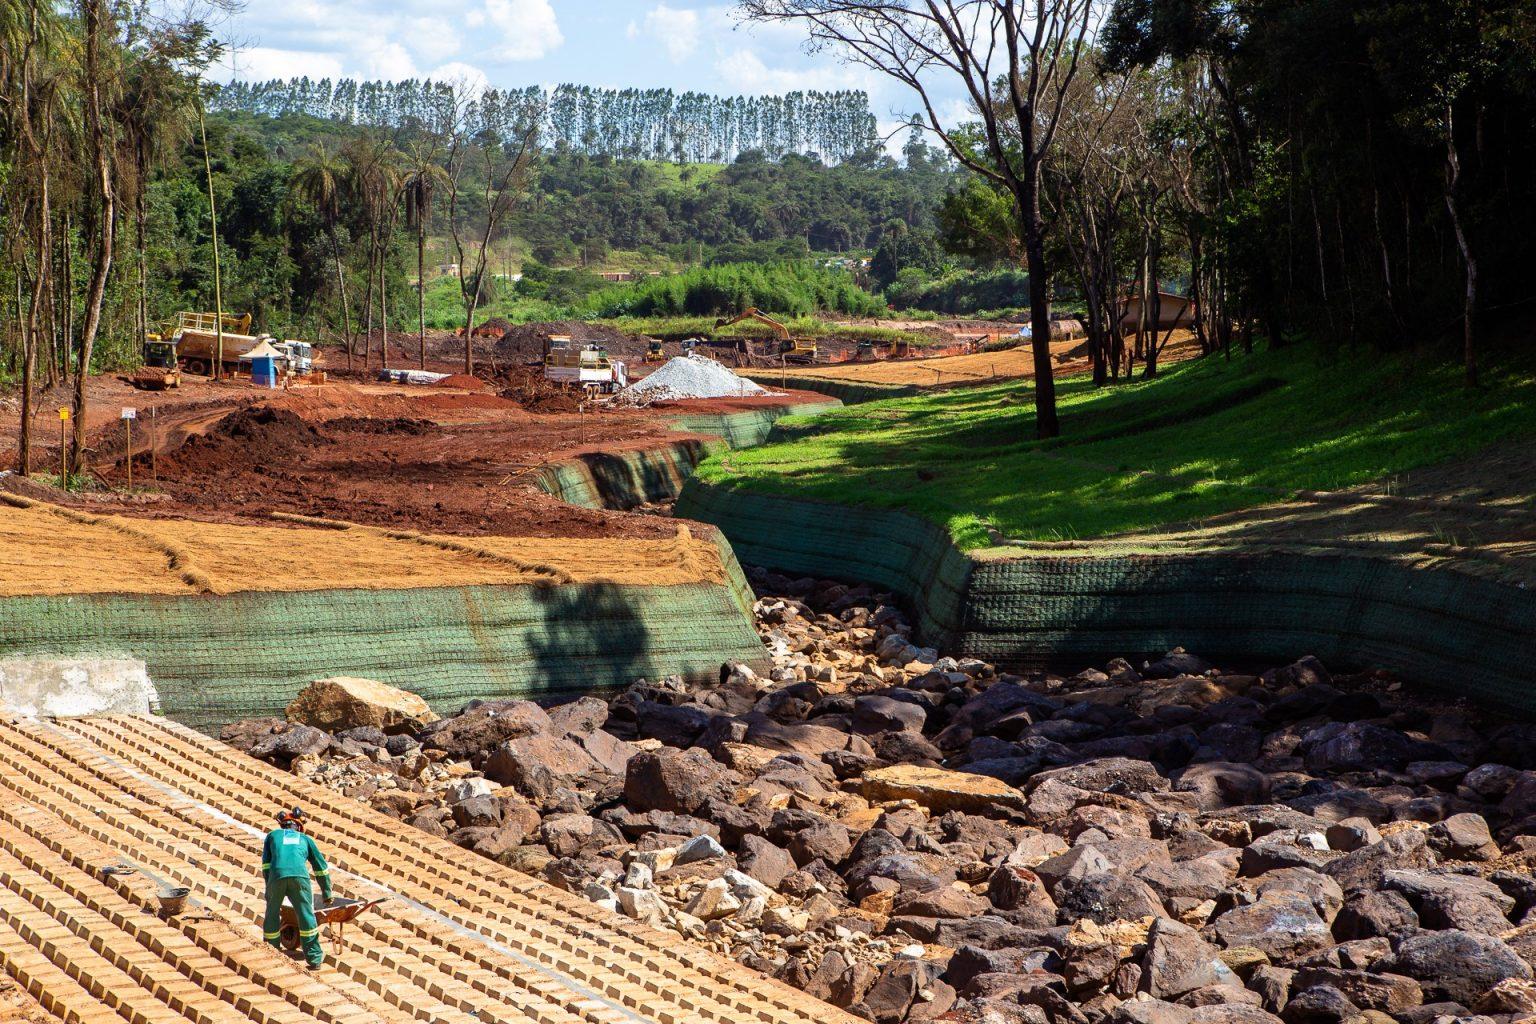 Vale launches environmental recovery project, Zero Milestone